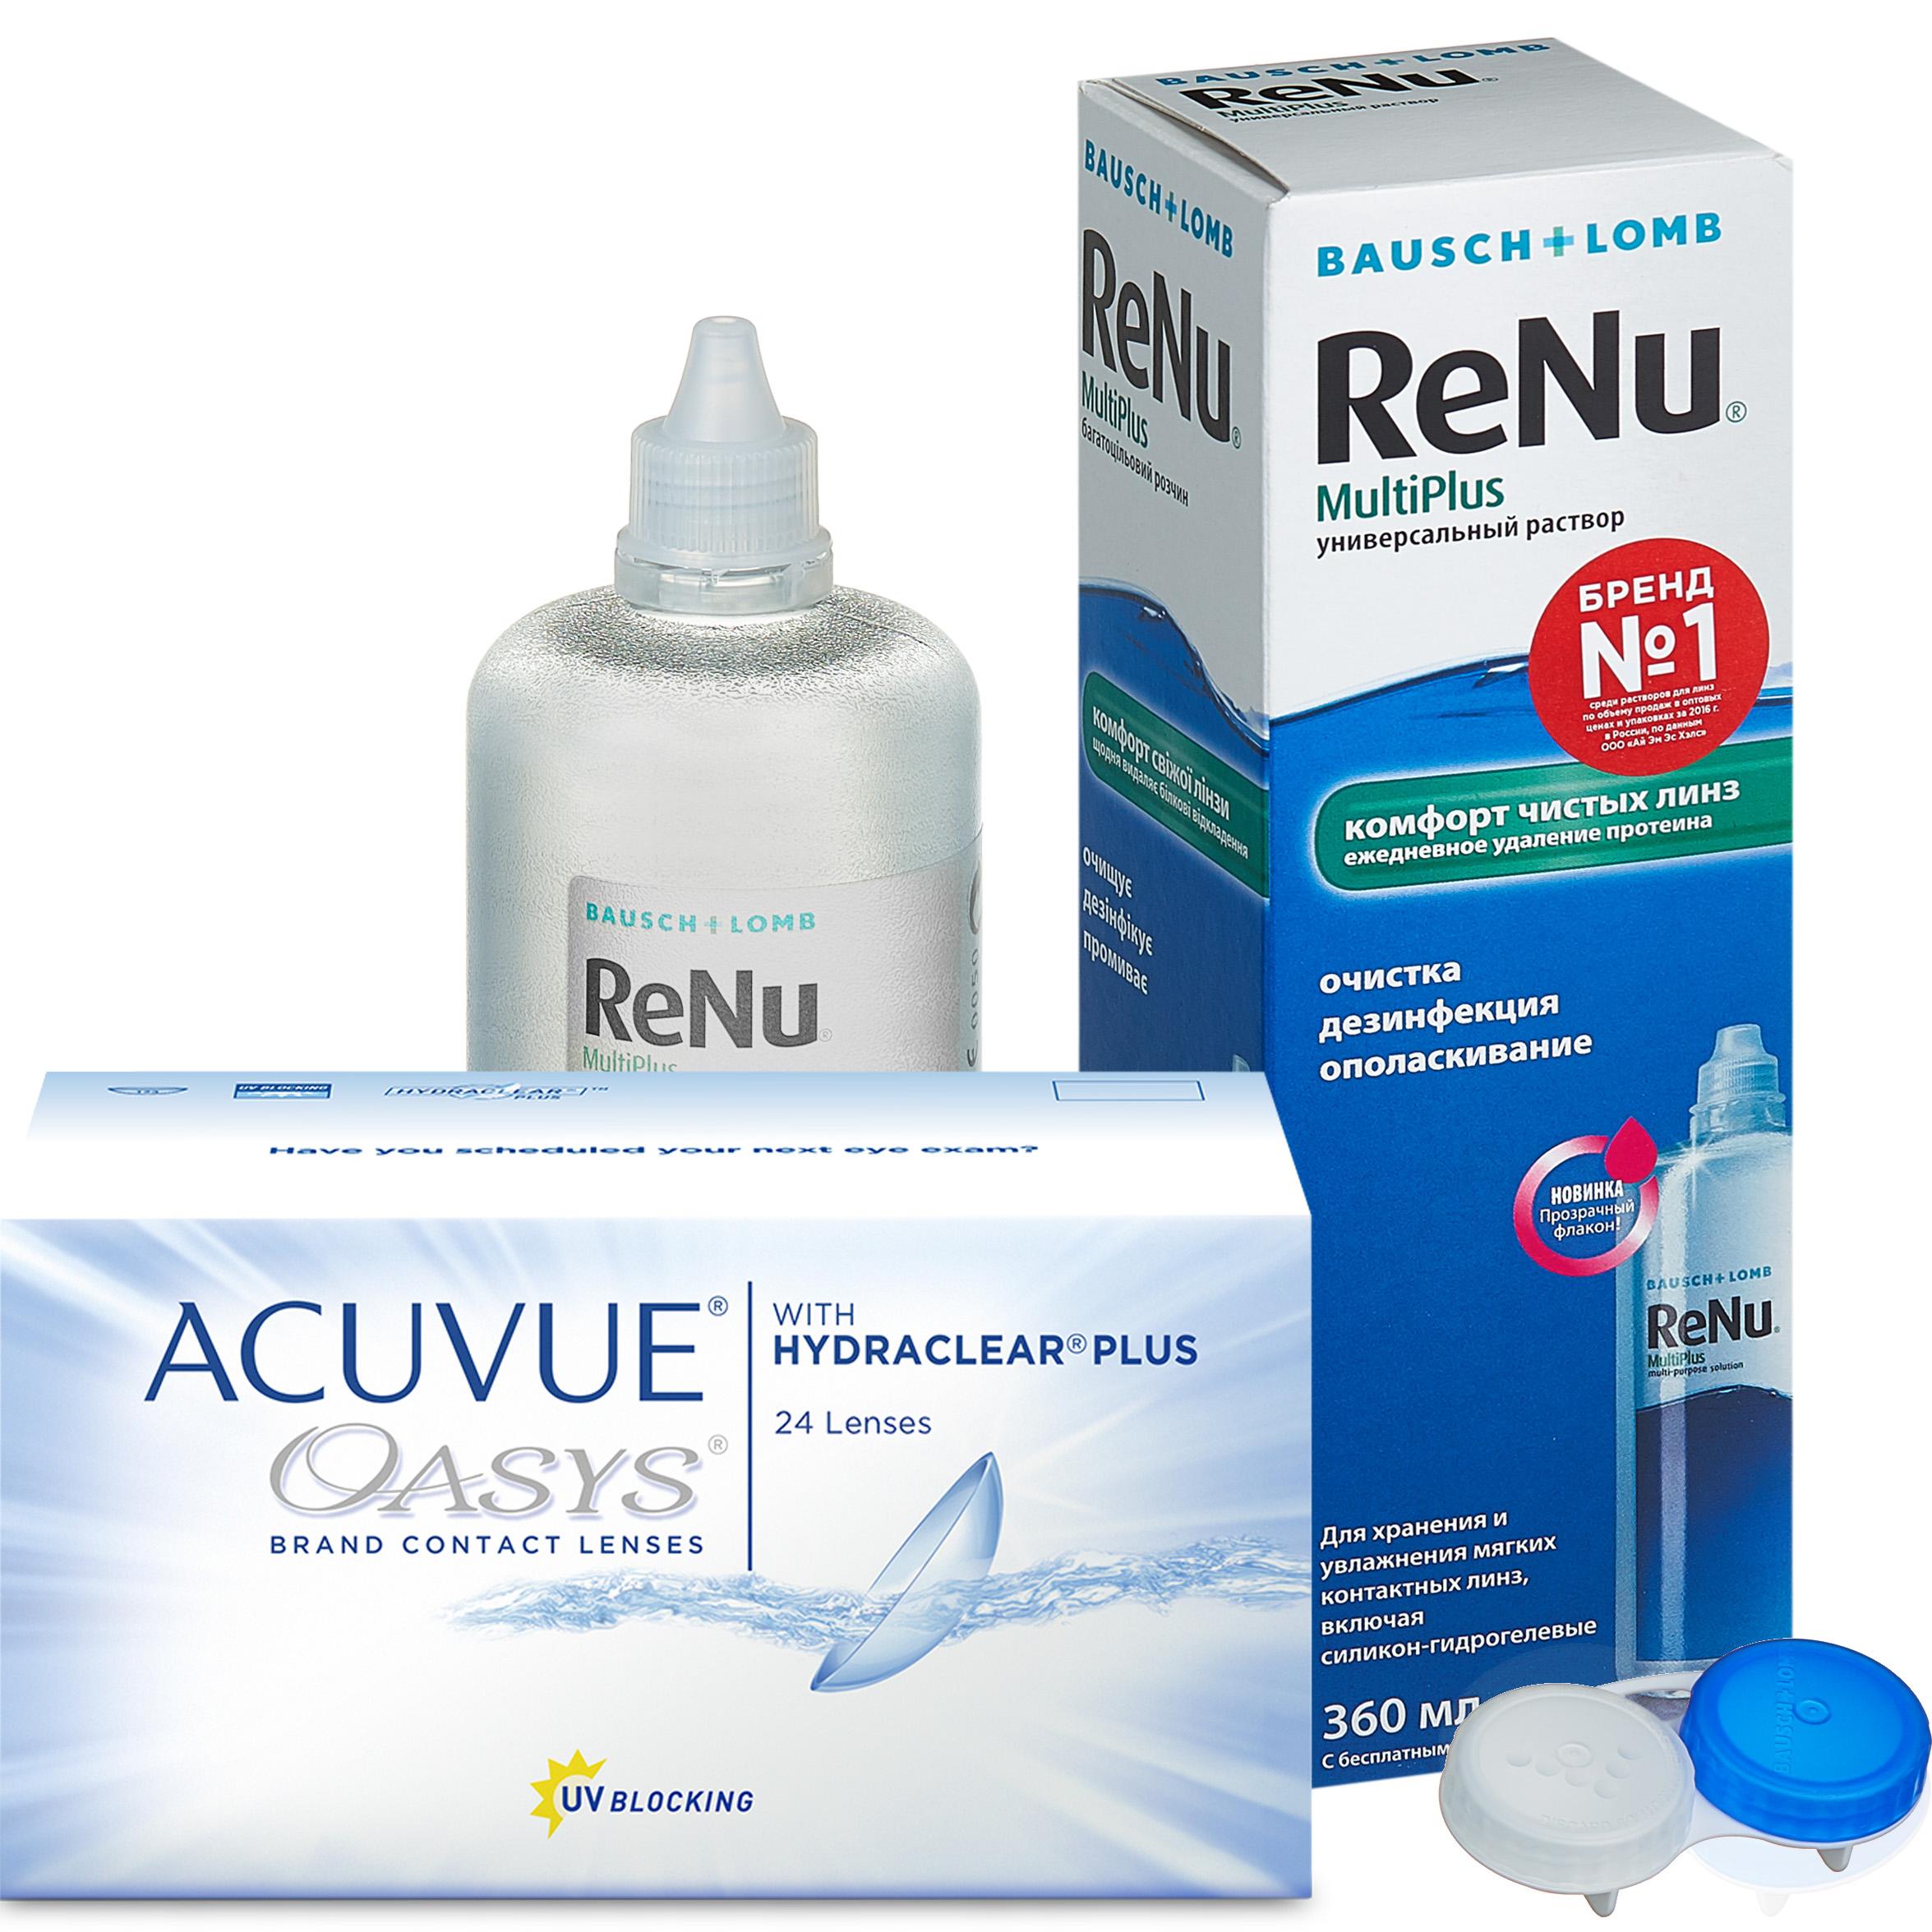 Купить Oasys with Hydraclear Plus 24 линзы + ReNu MultiPlus, Линзы Acuvue Oasys with Hydraclear Plus 24 линзы R 8.8 -5, 50 + ReNu Multi Plus 360 мл